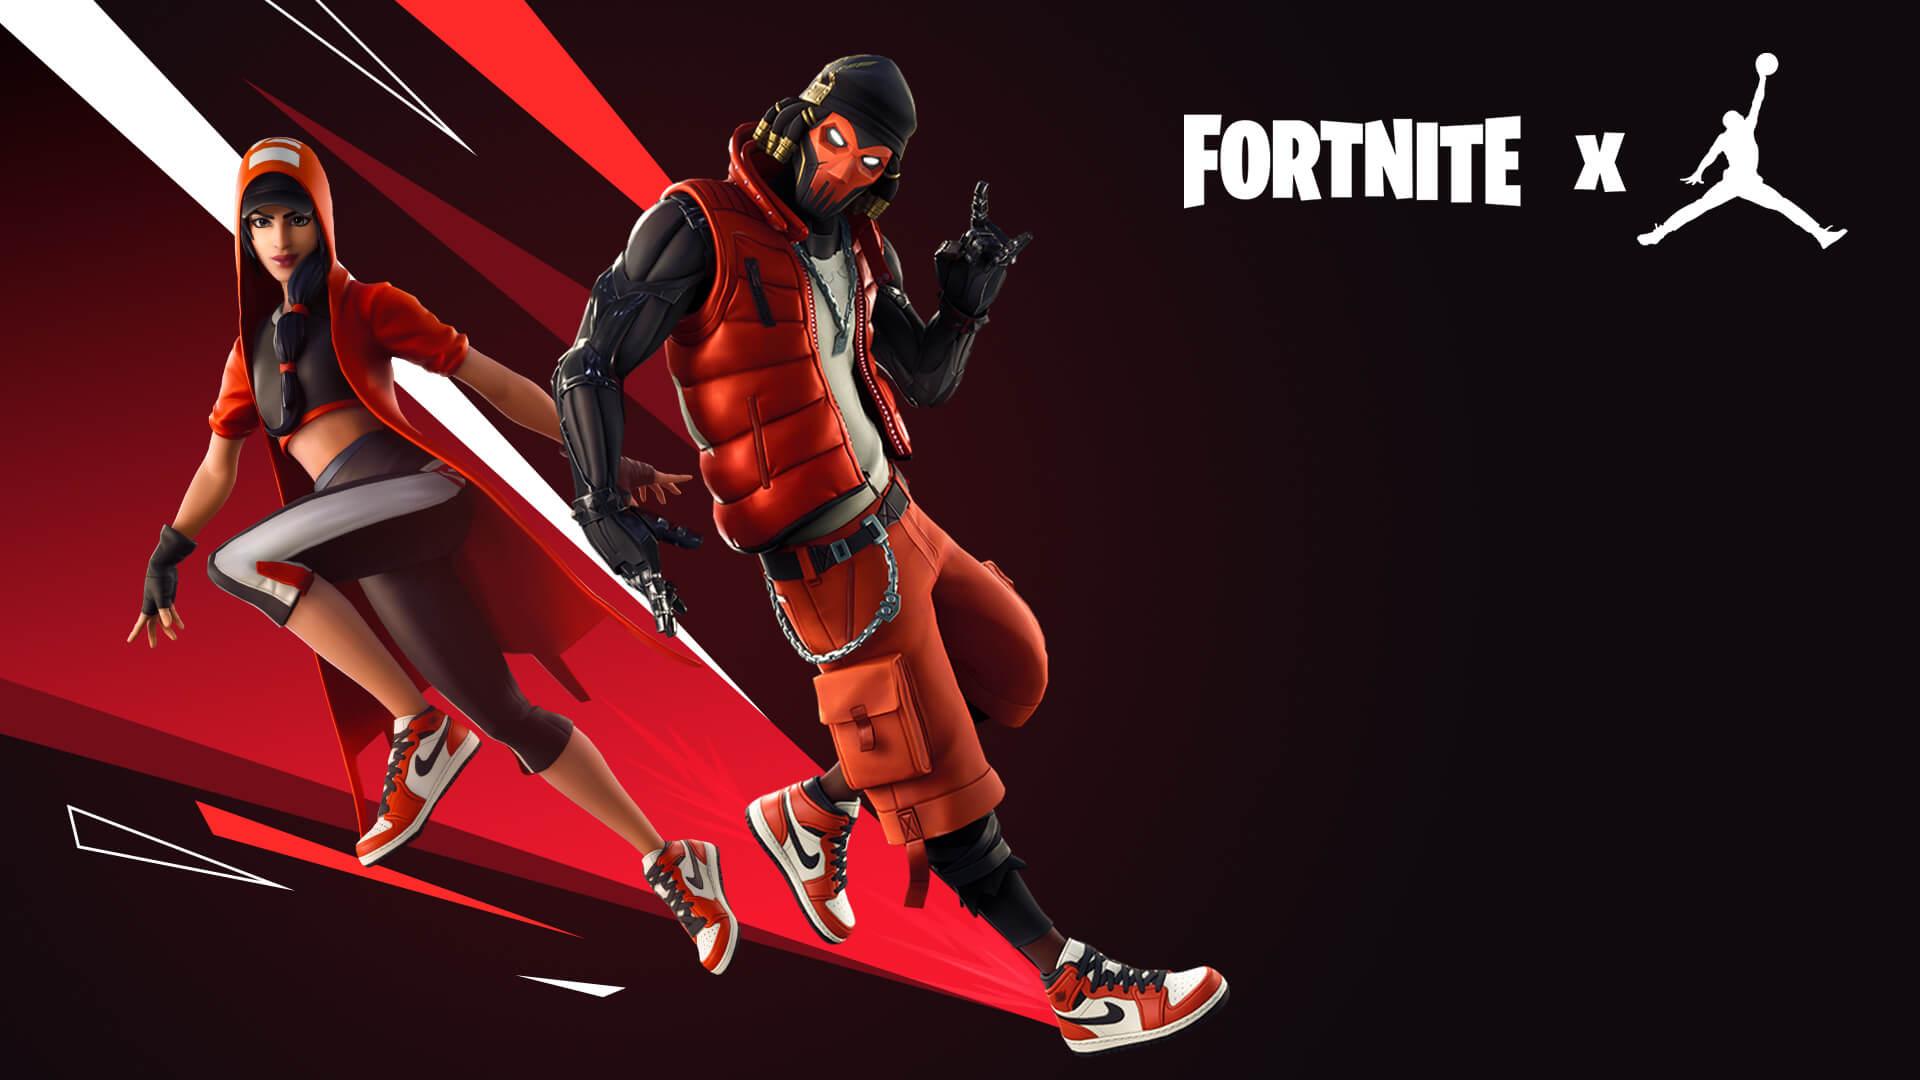 Air Jordans come to Fortnite in Nike partnership